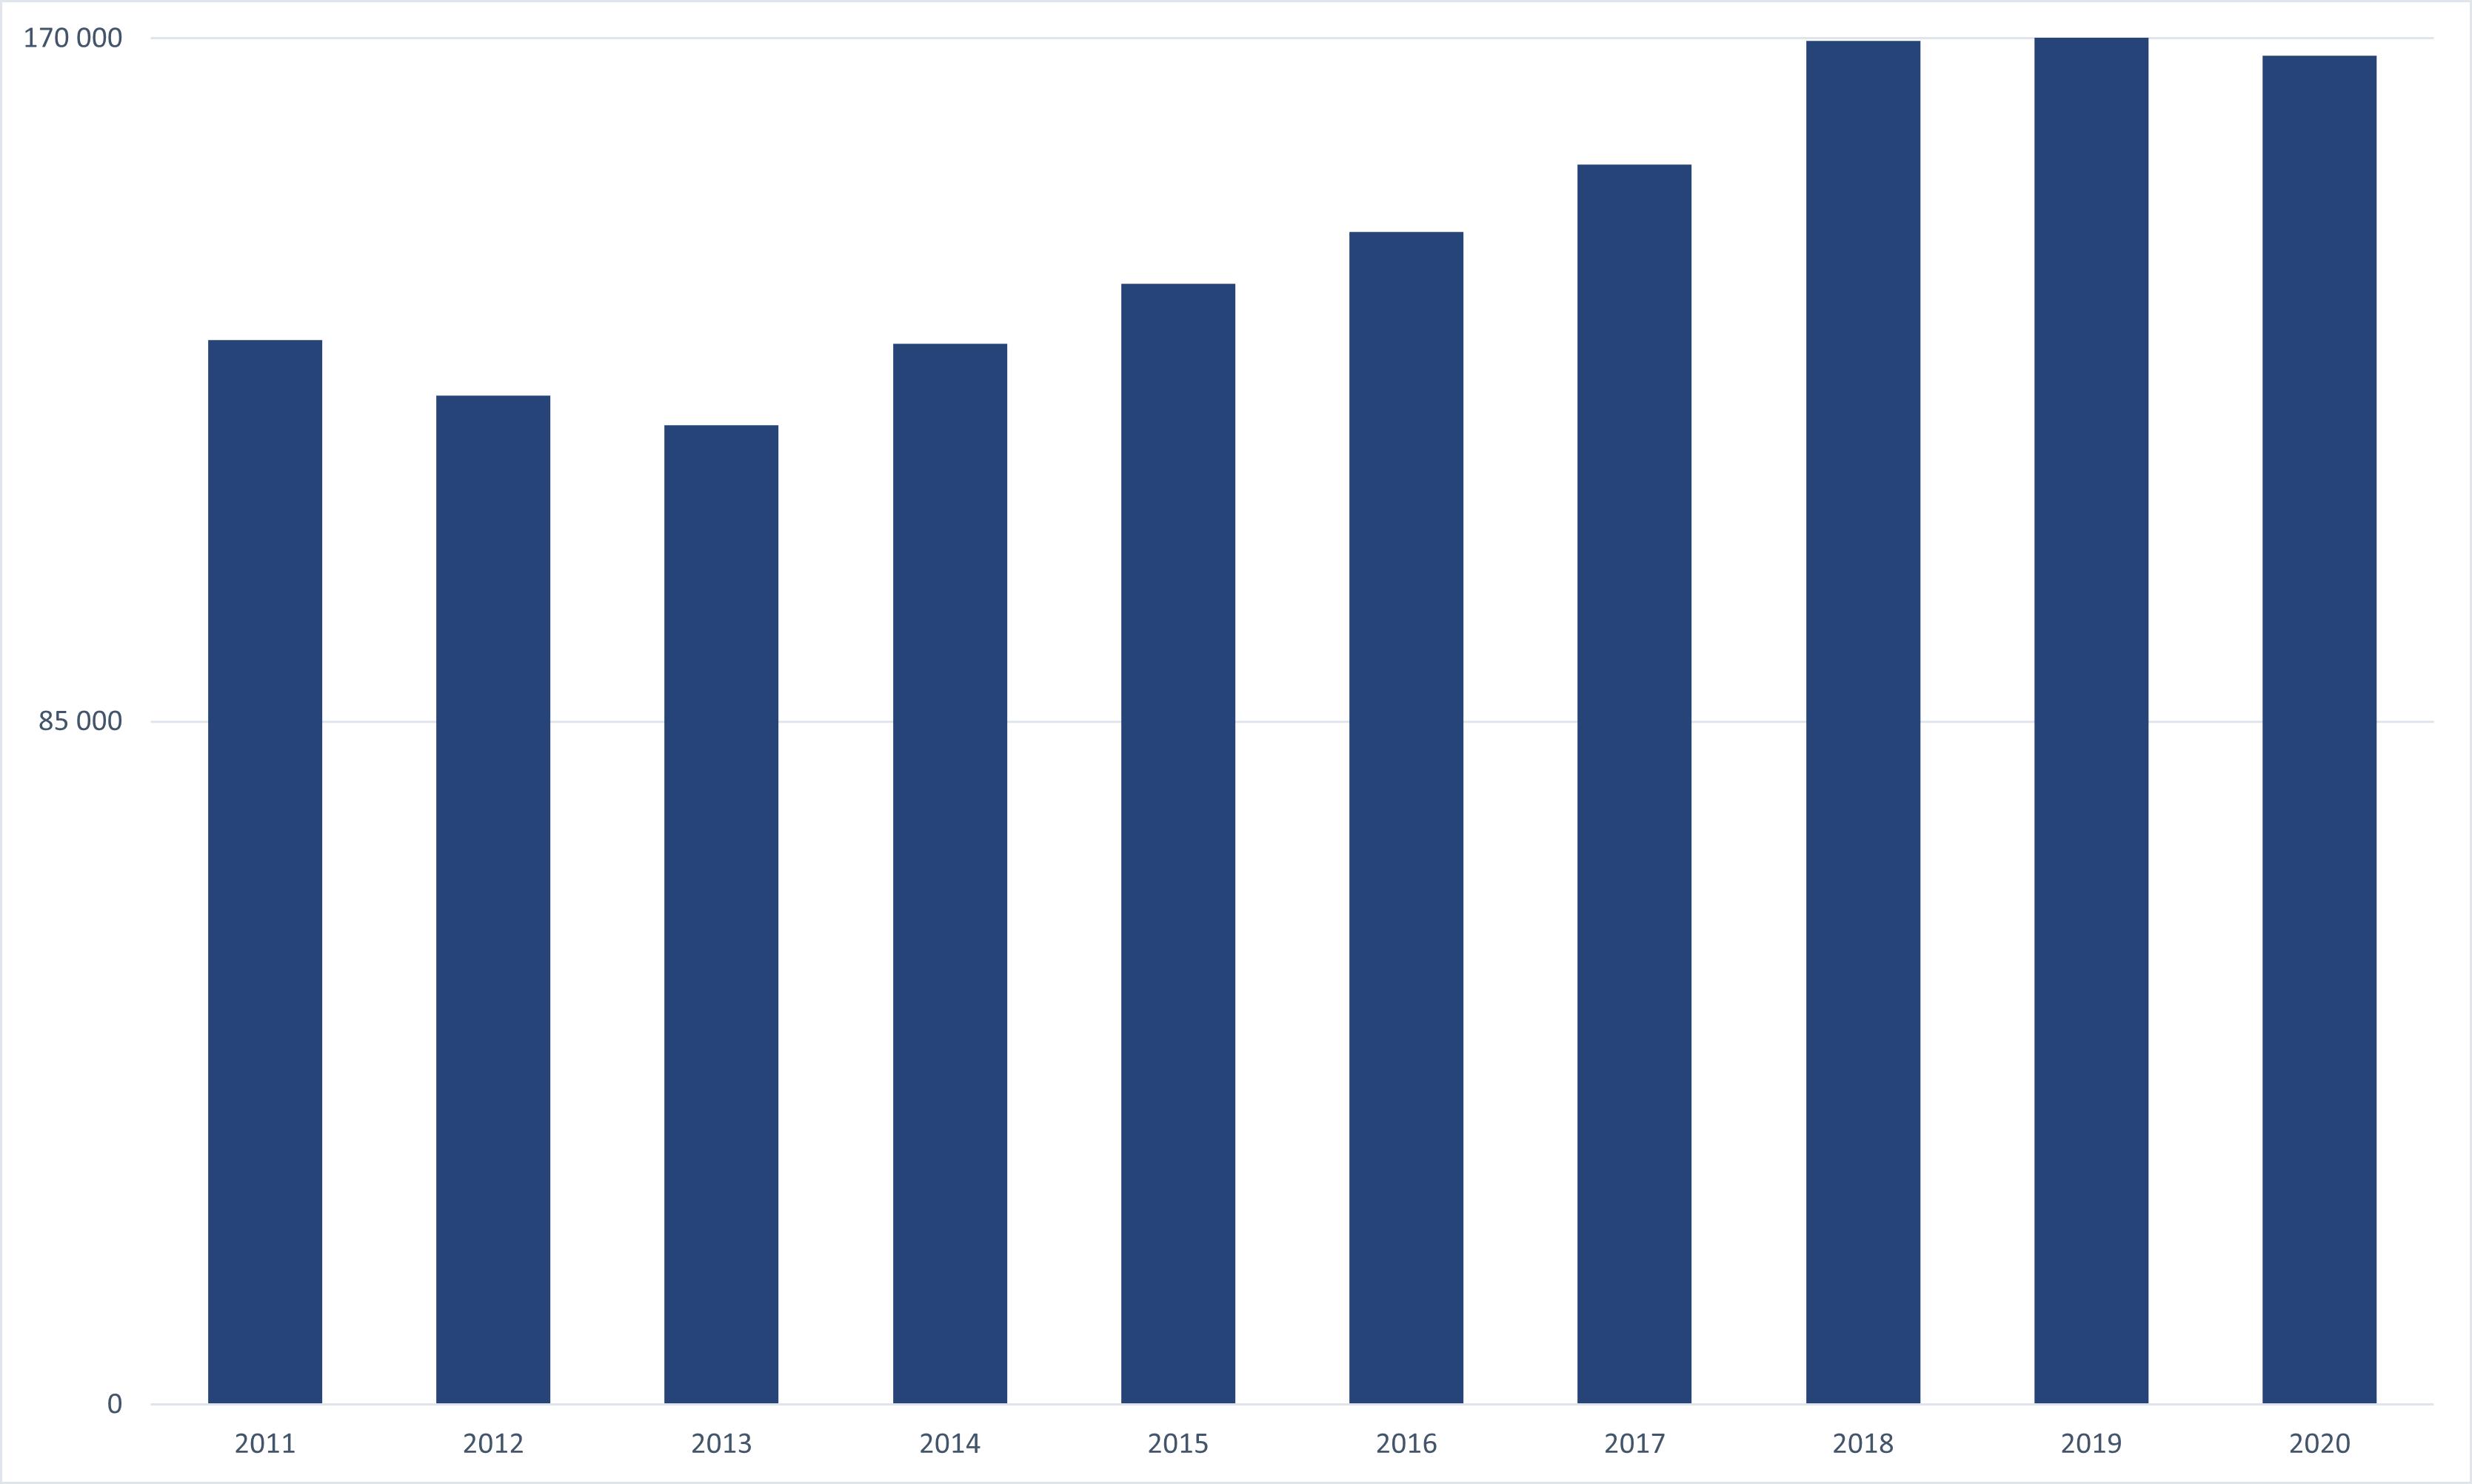 Počet zpracovaných vybraných VUŽ